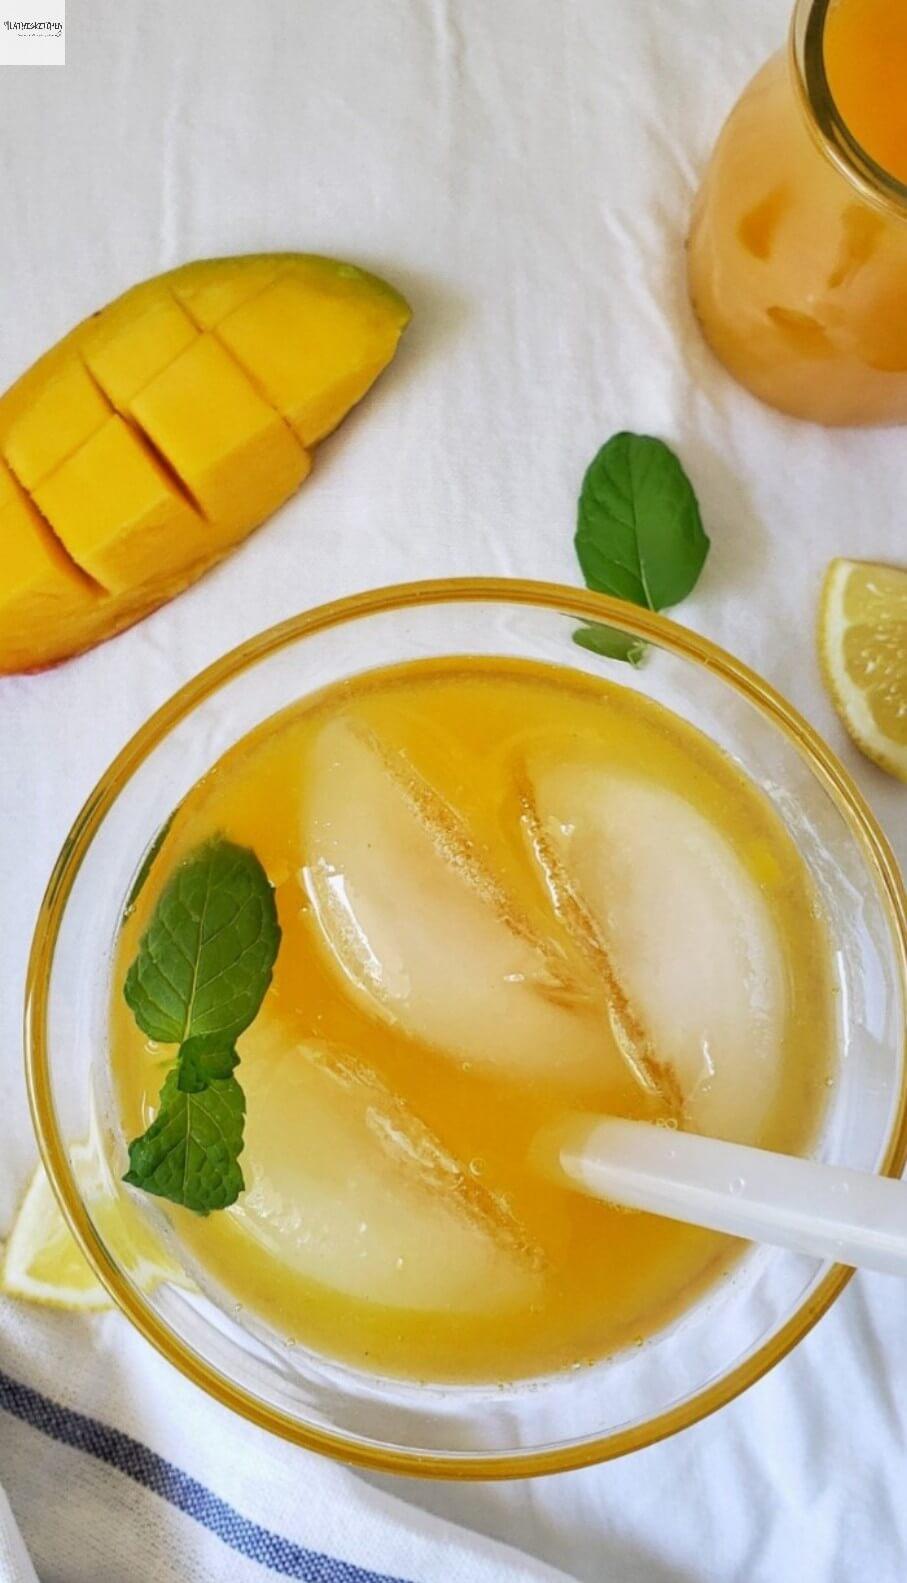 Glass of Mango Lemonade with mango and lemon wedges on side and mint leaves.